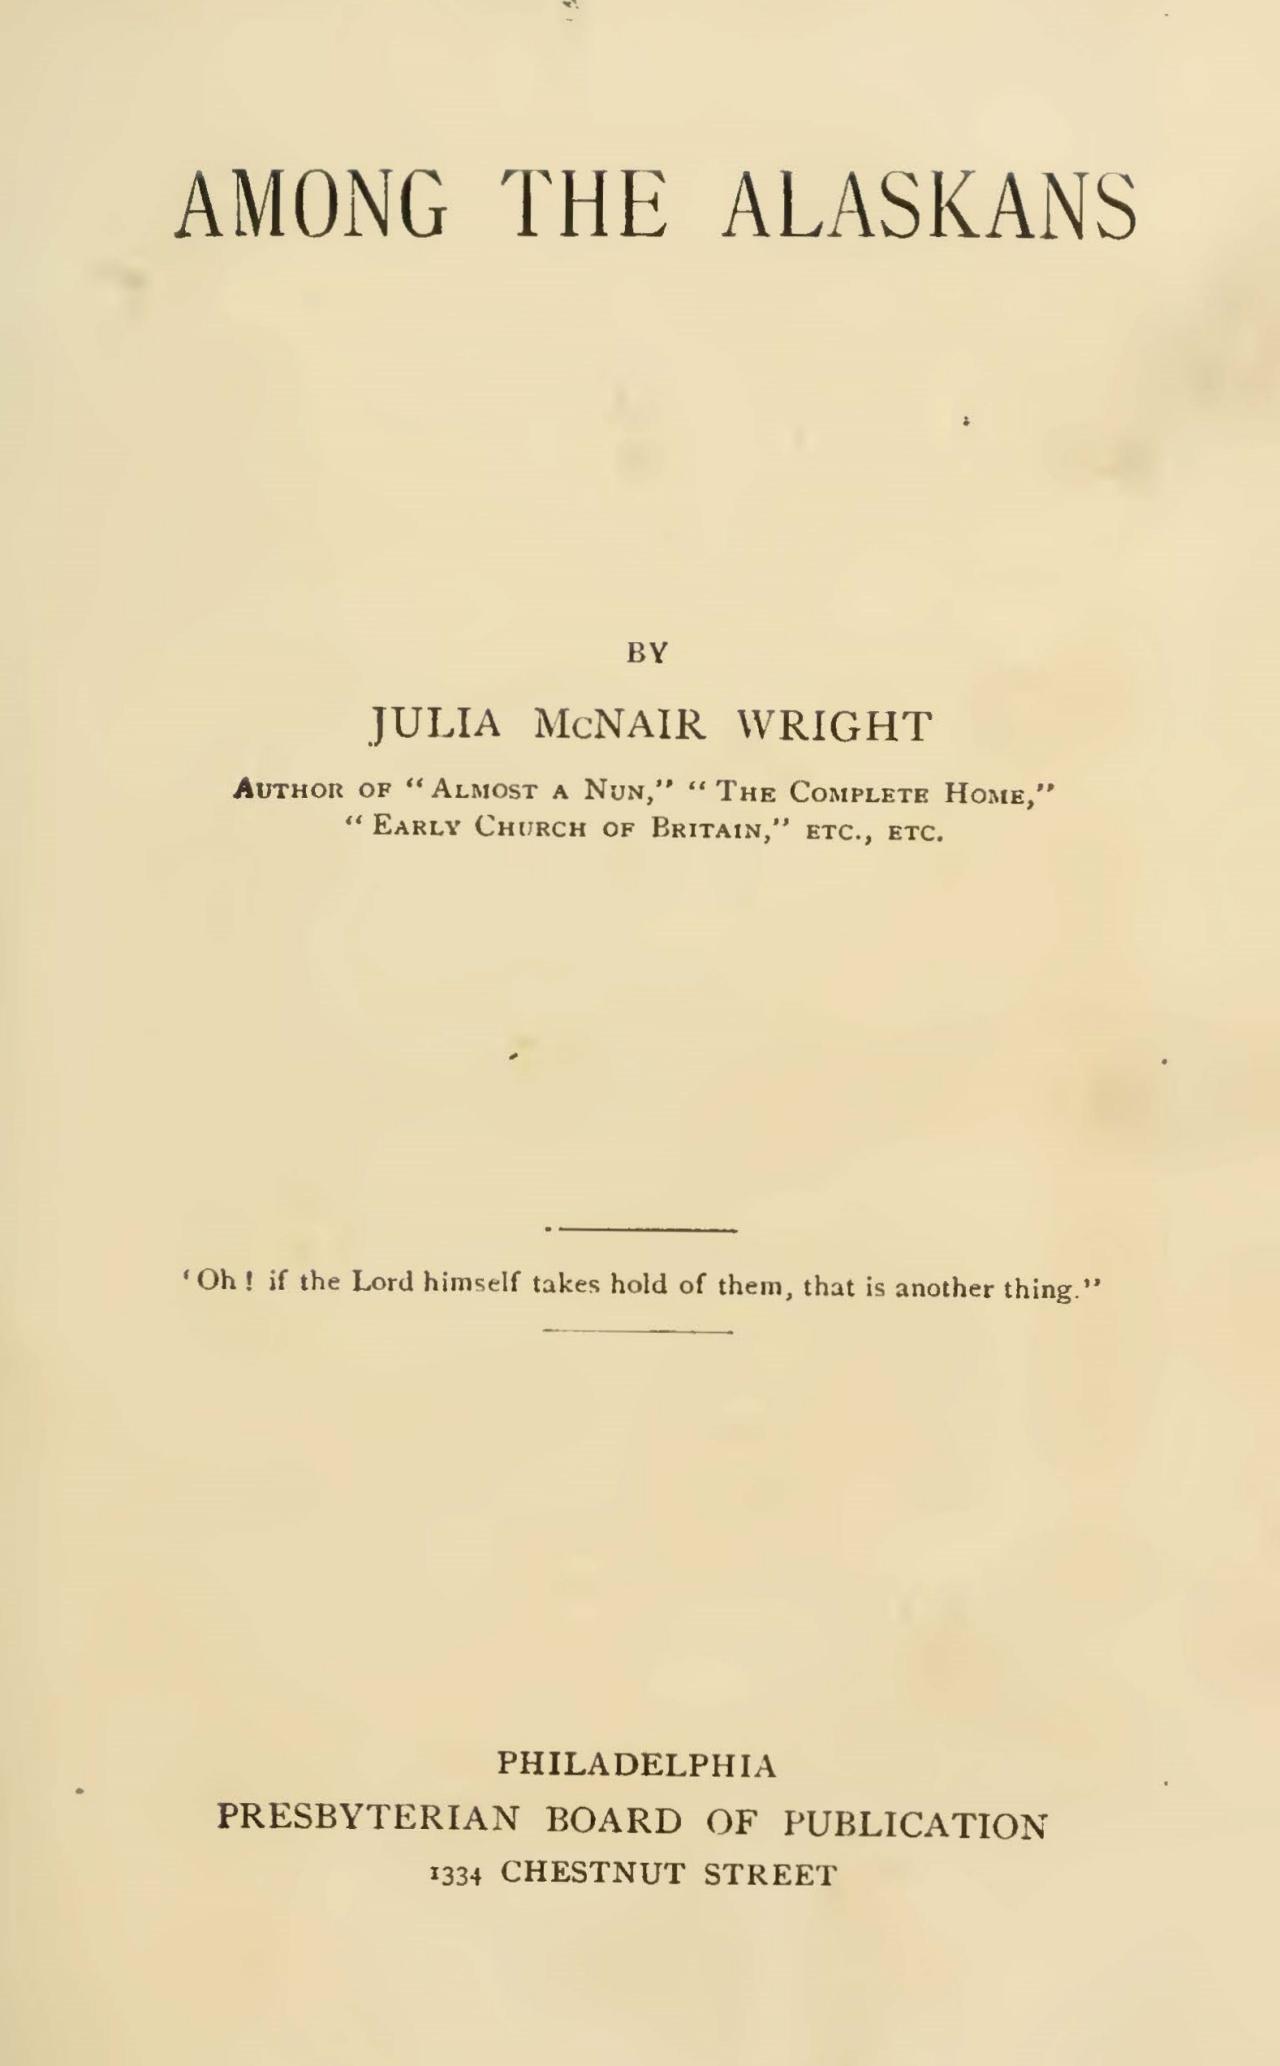 Wright, Julia McNair, Among the Alaskans Title Page.jpg